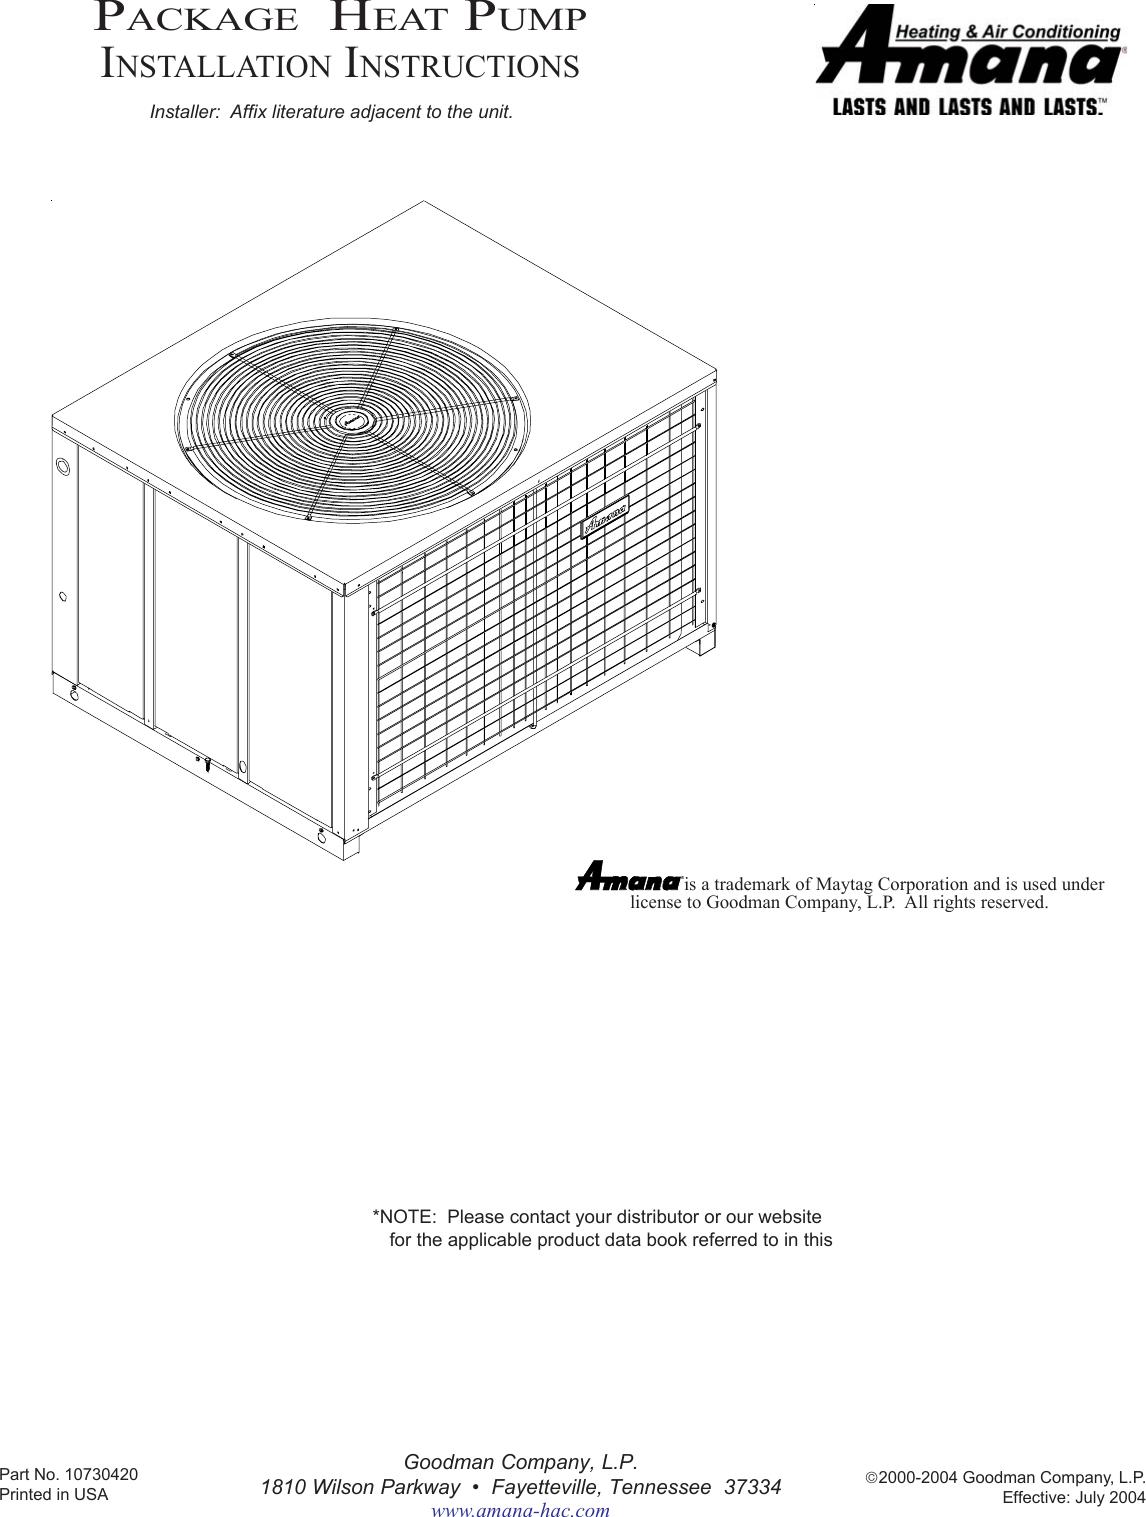 Amana Package Heat Pump Users Manual 10730418 Rev 3 Wiring Diagram For Goodman Ac Unit